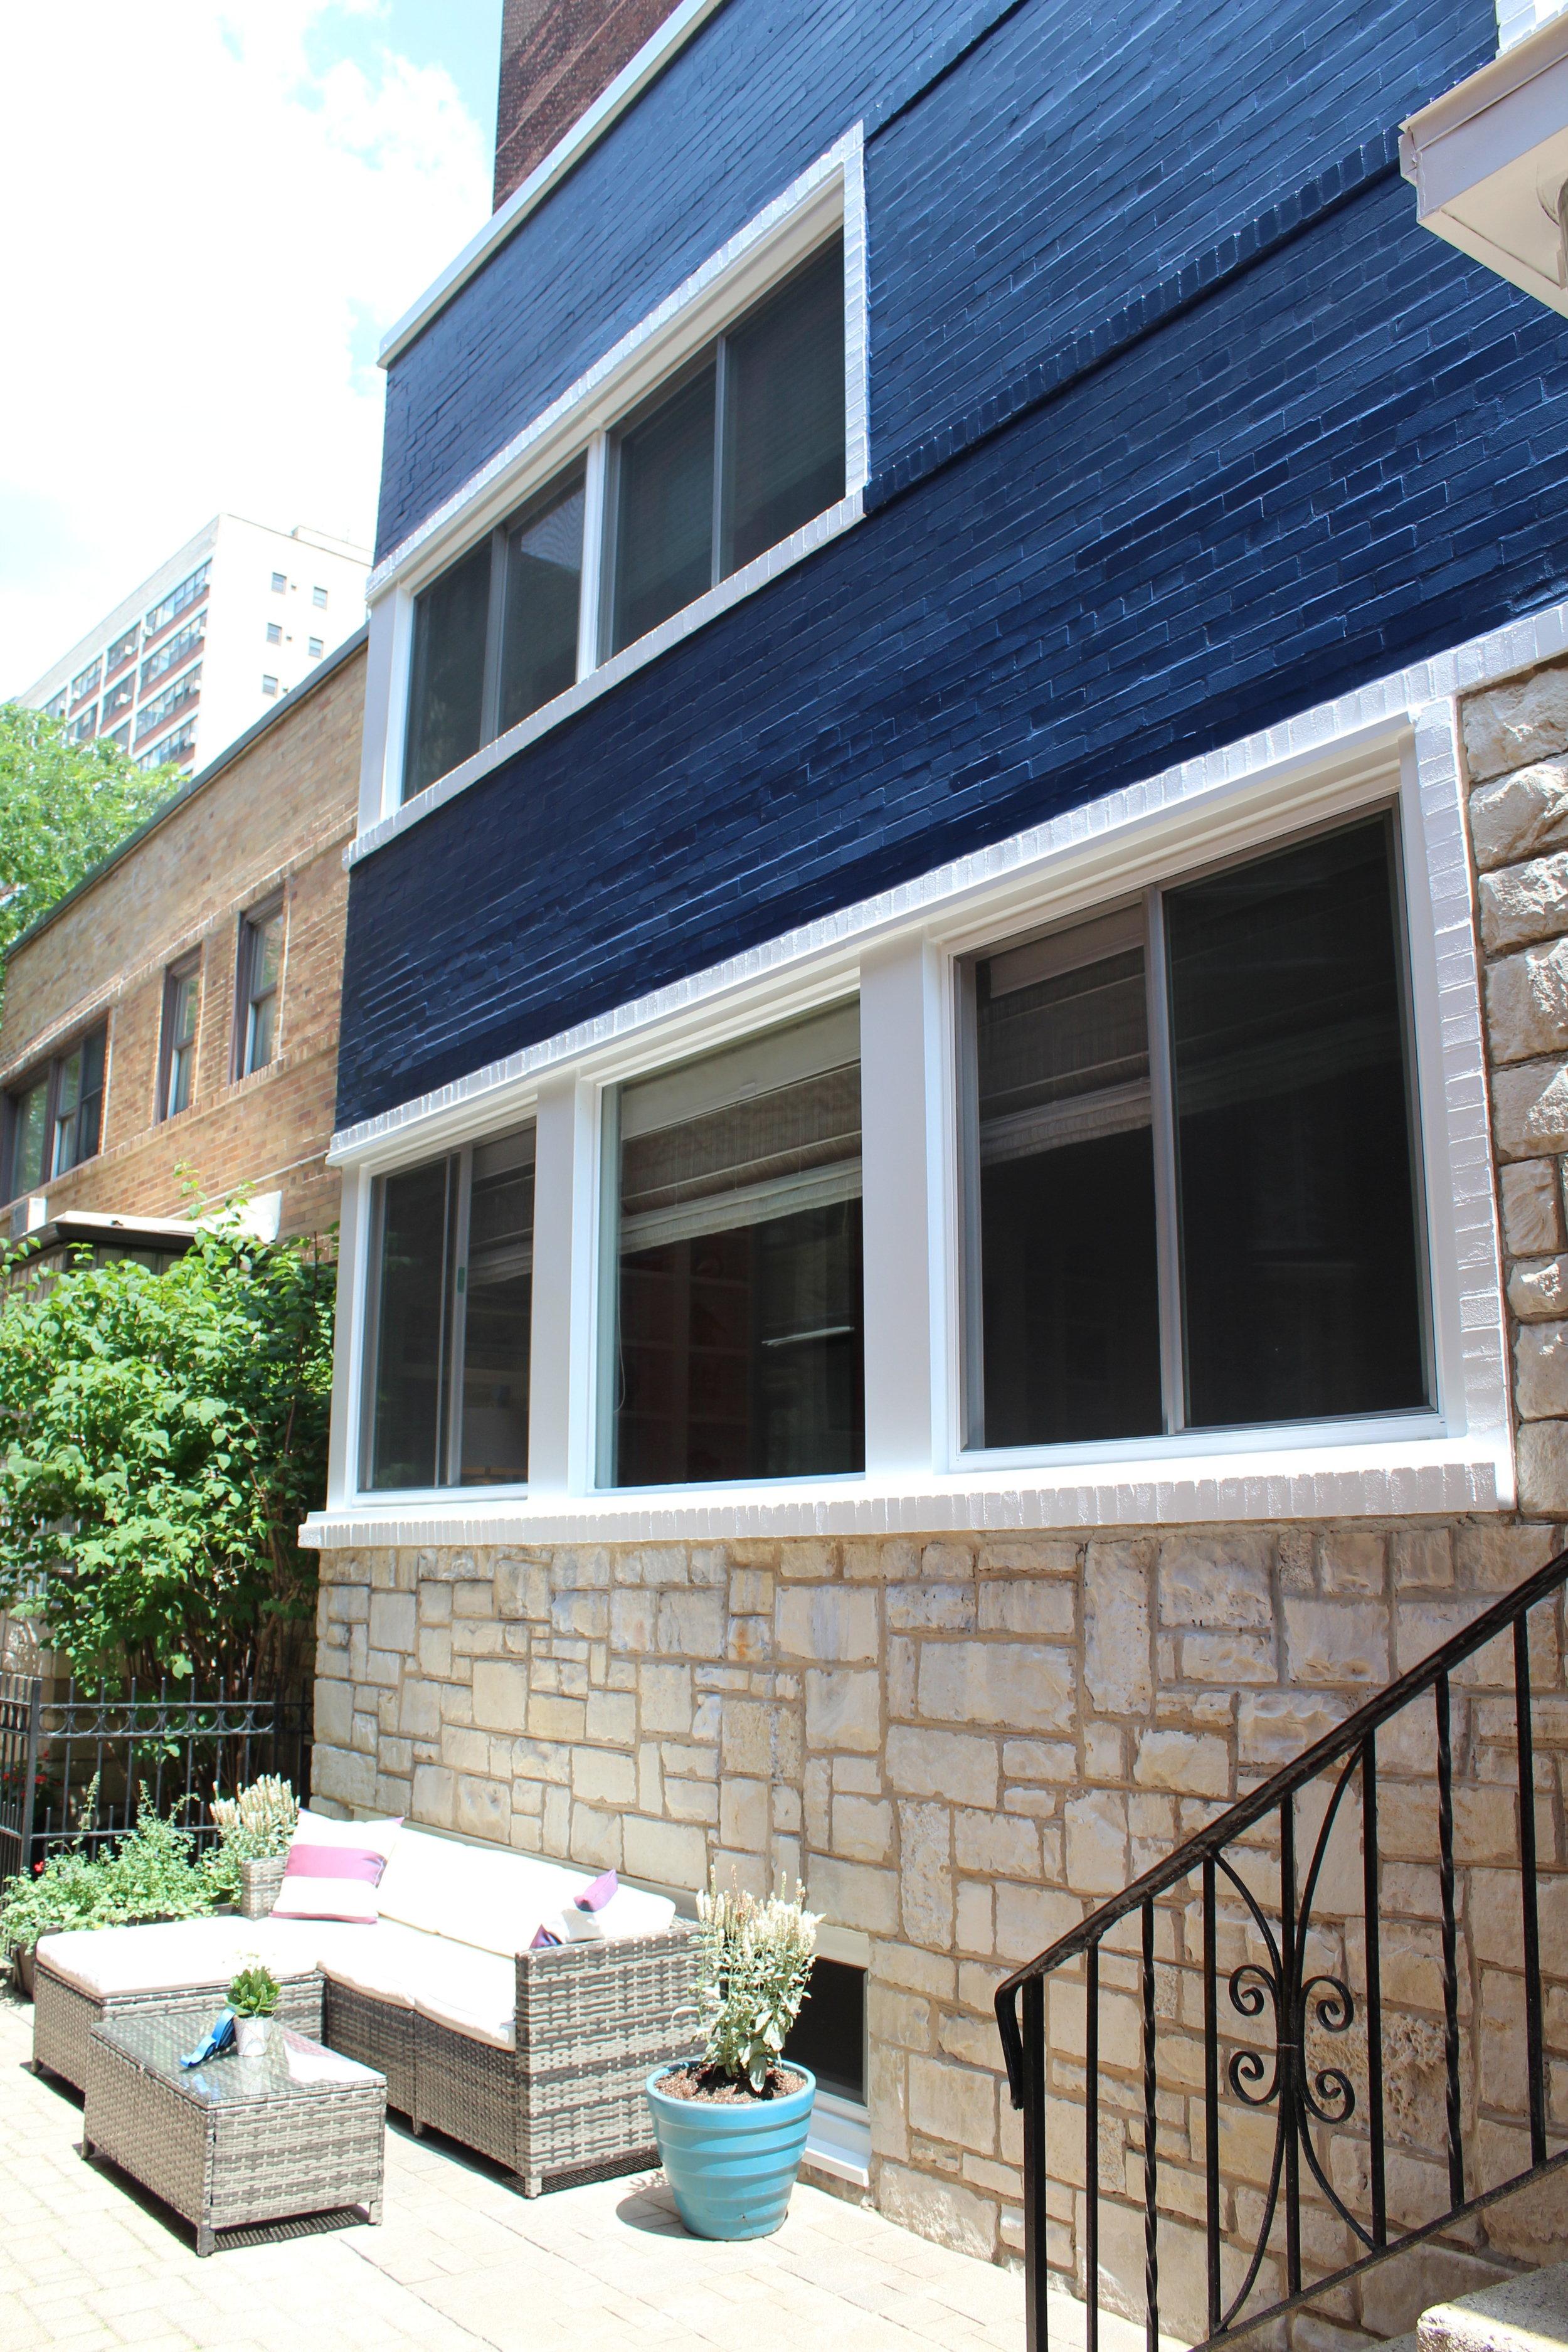 1. Navy and White Paint 2. Acid Wash Stone 3. New Windows